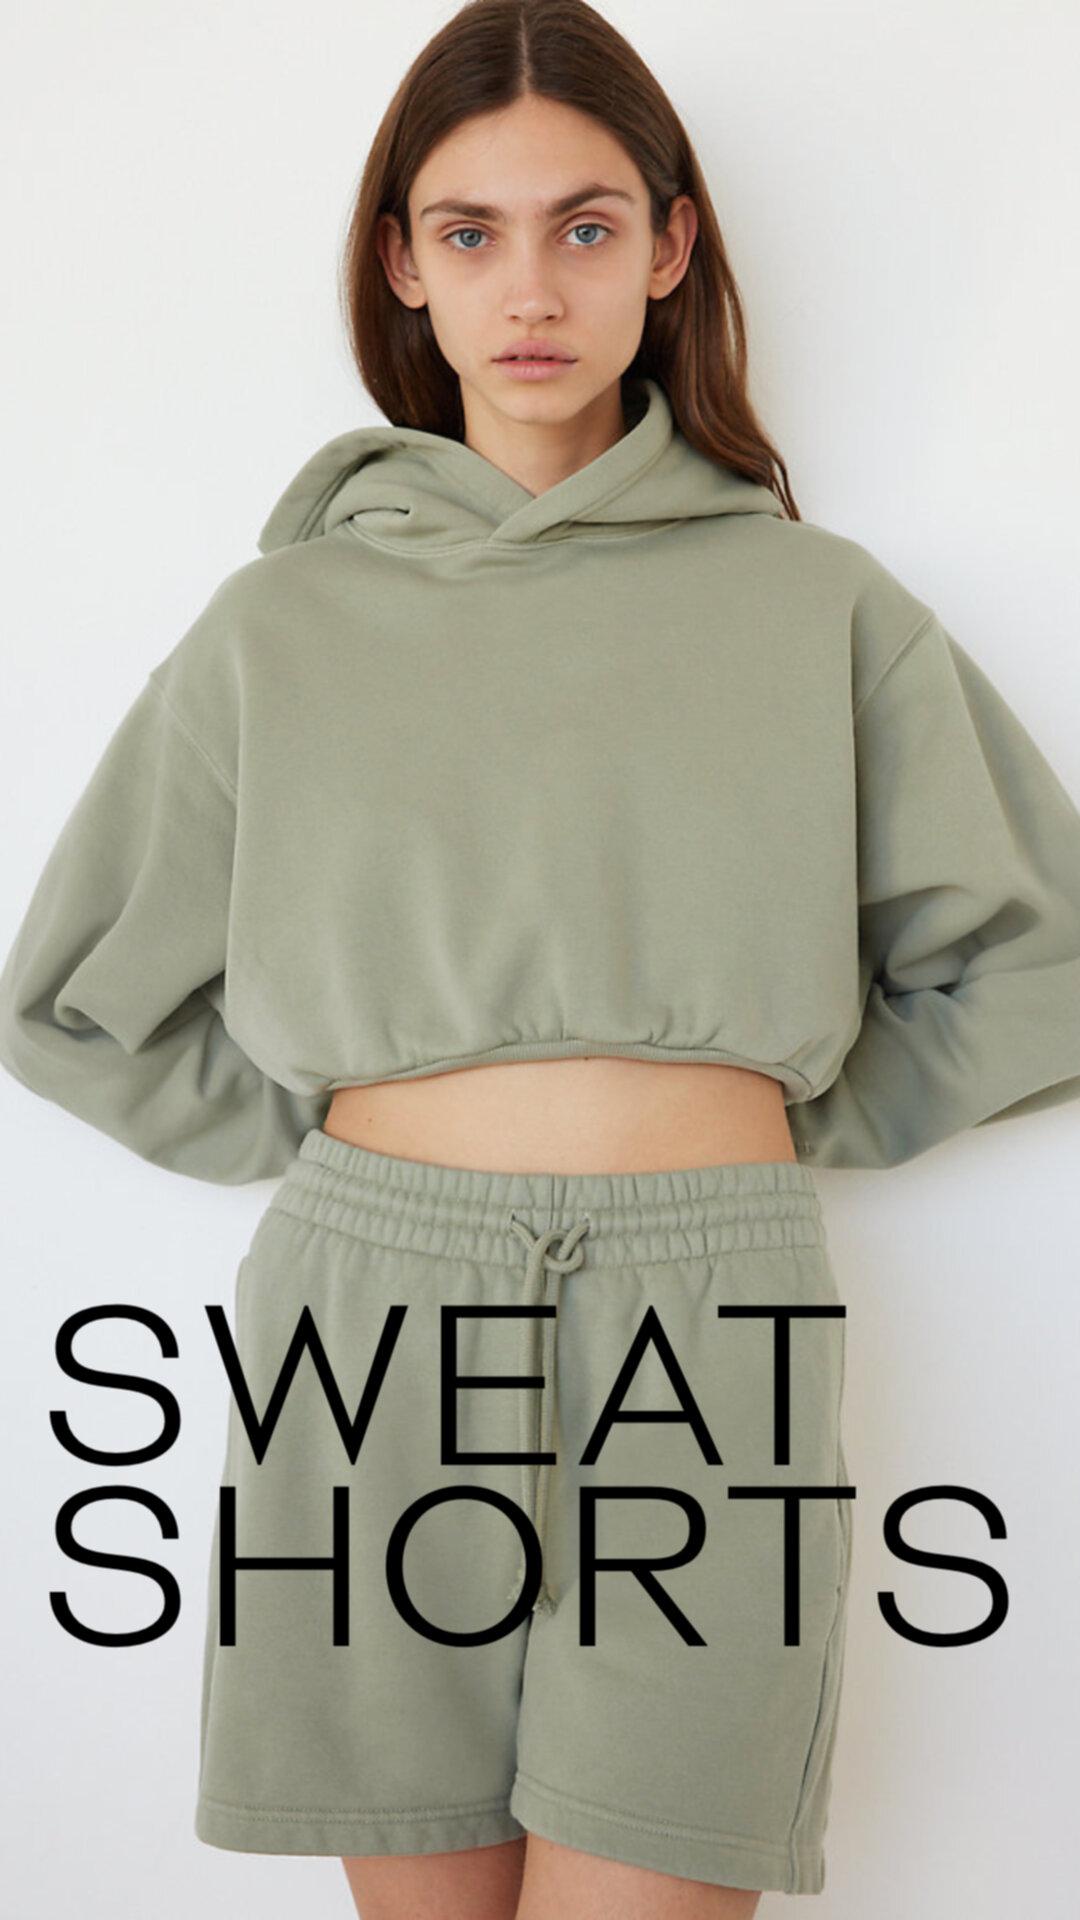 Sweatshorts Story 1